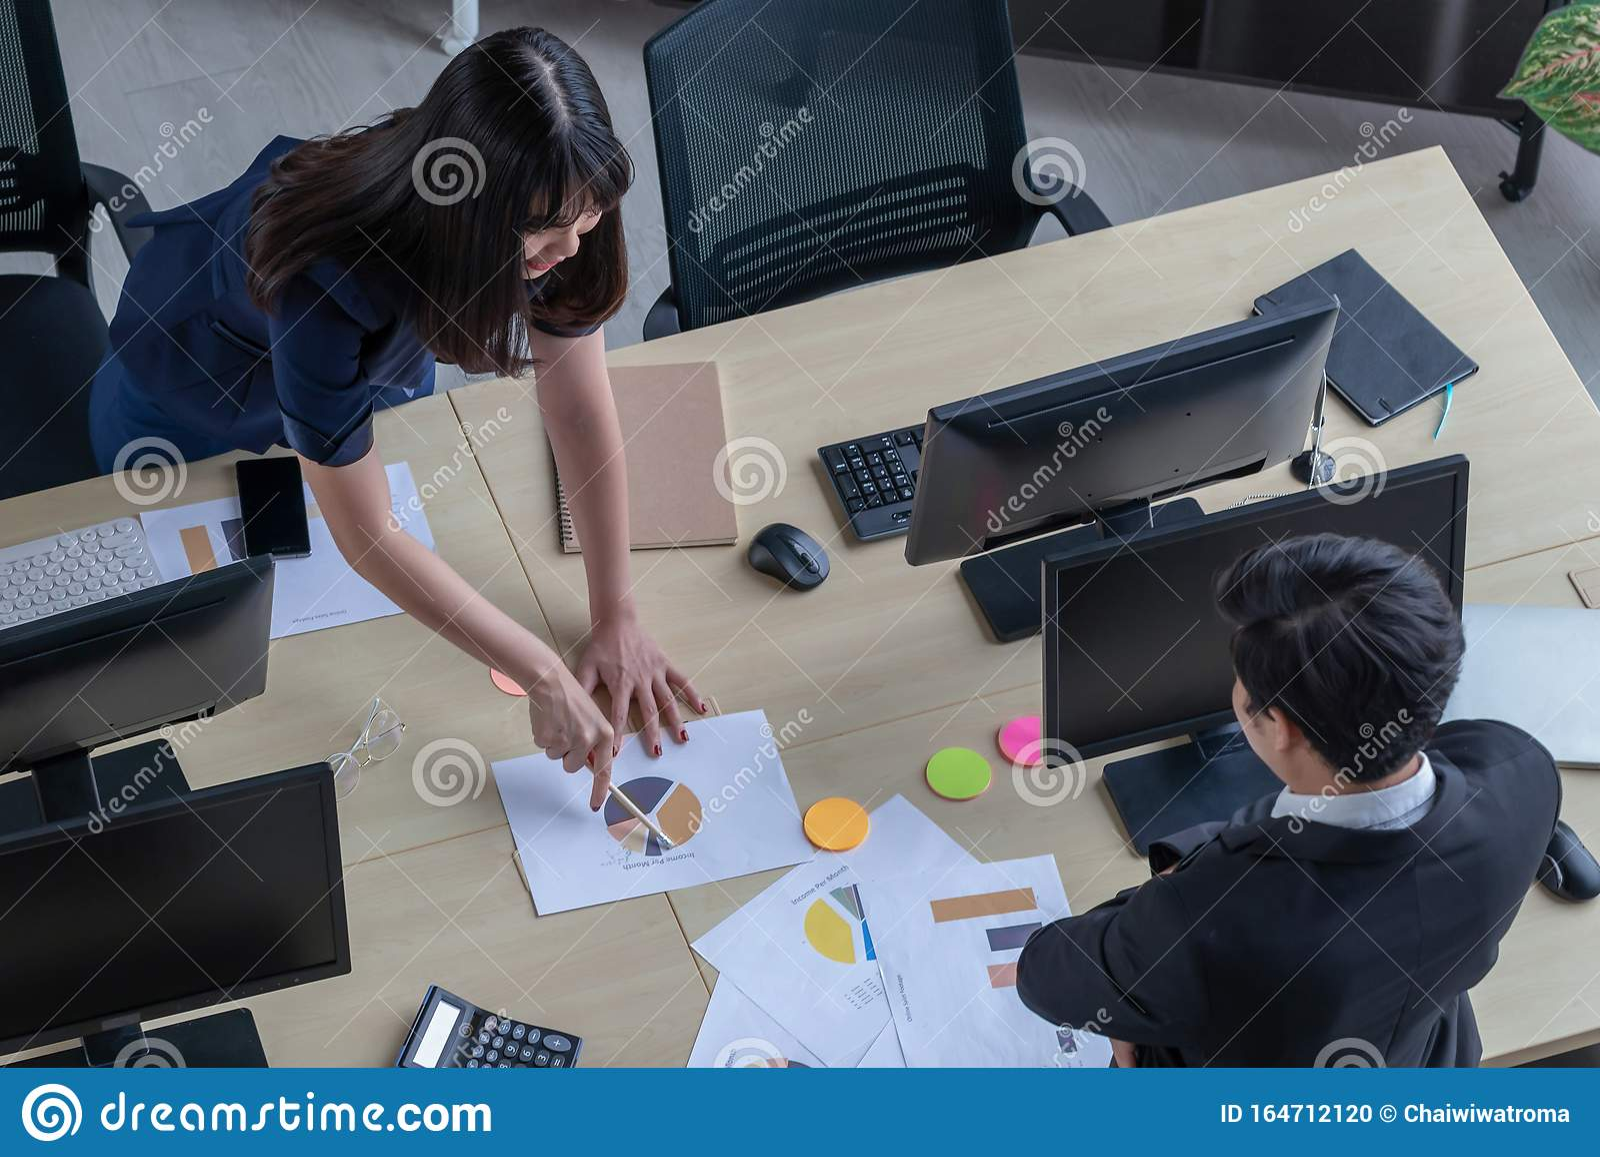 Мужчине на работу девушке работа для девушек без опыта работы самара